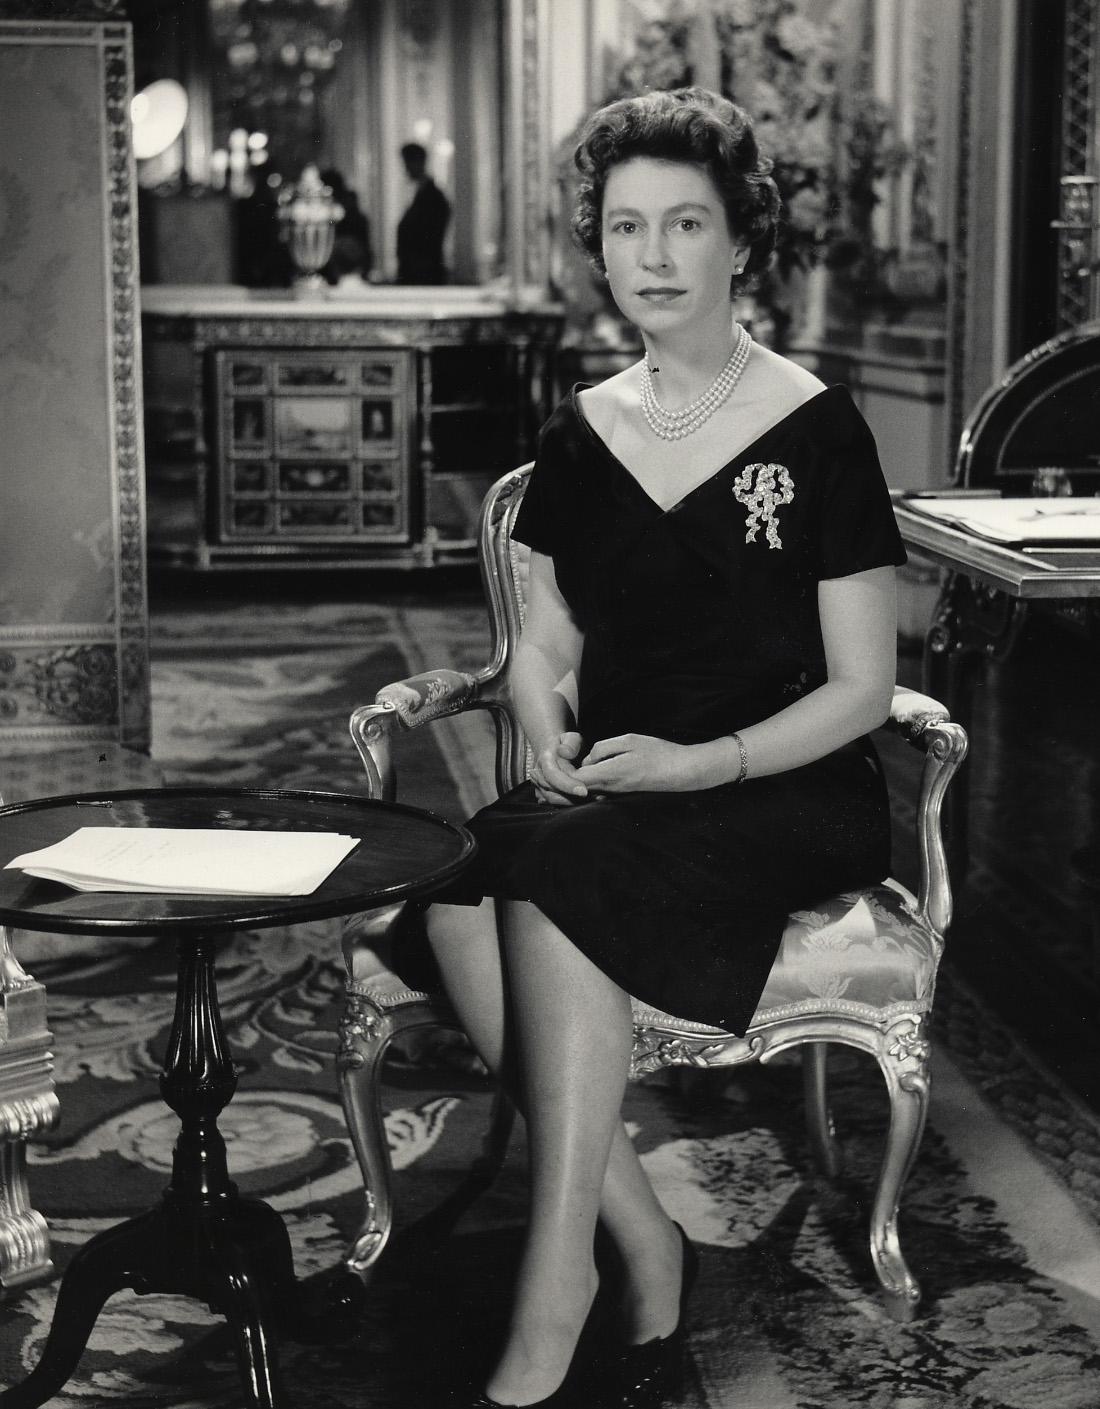 Image Result For Royal Wedding Televised